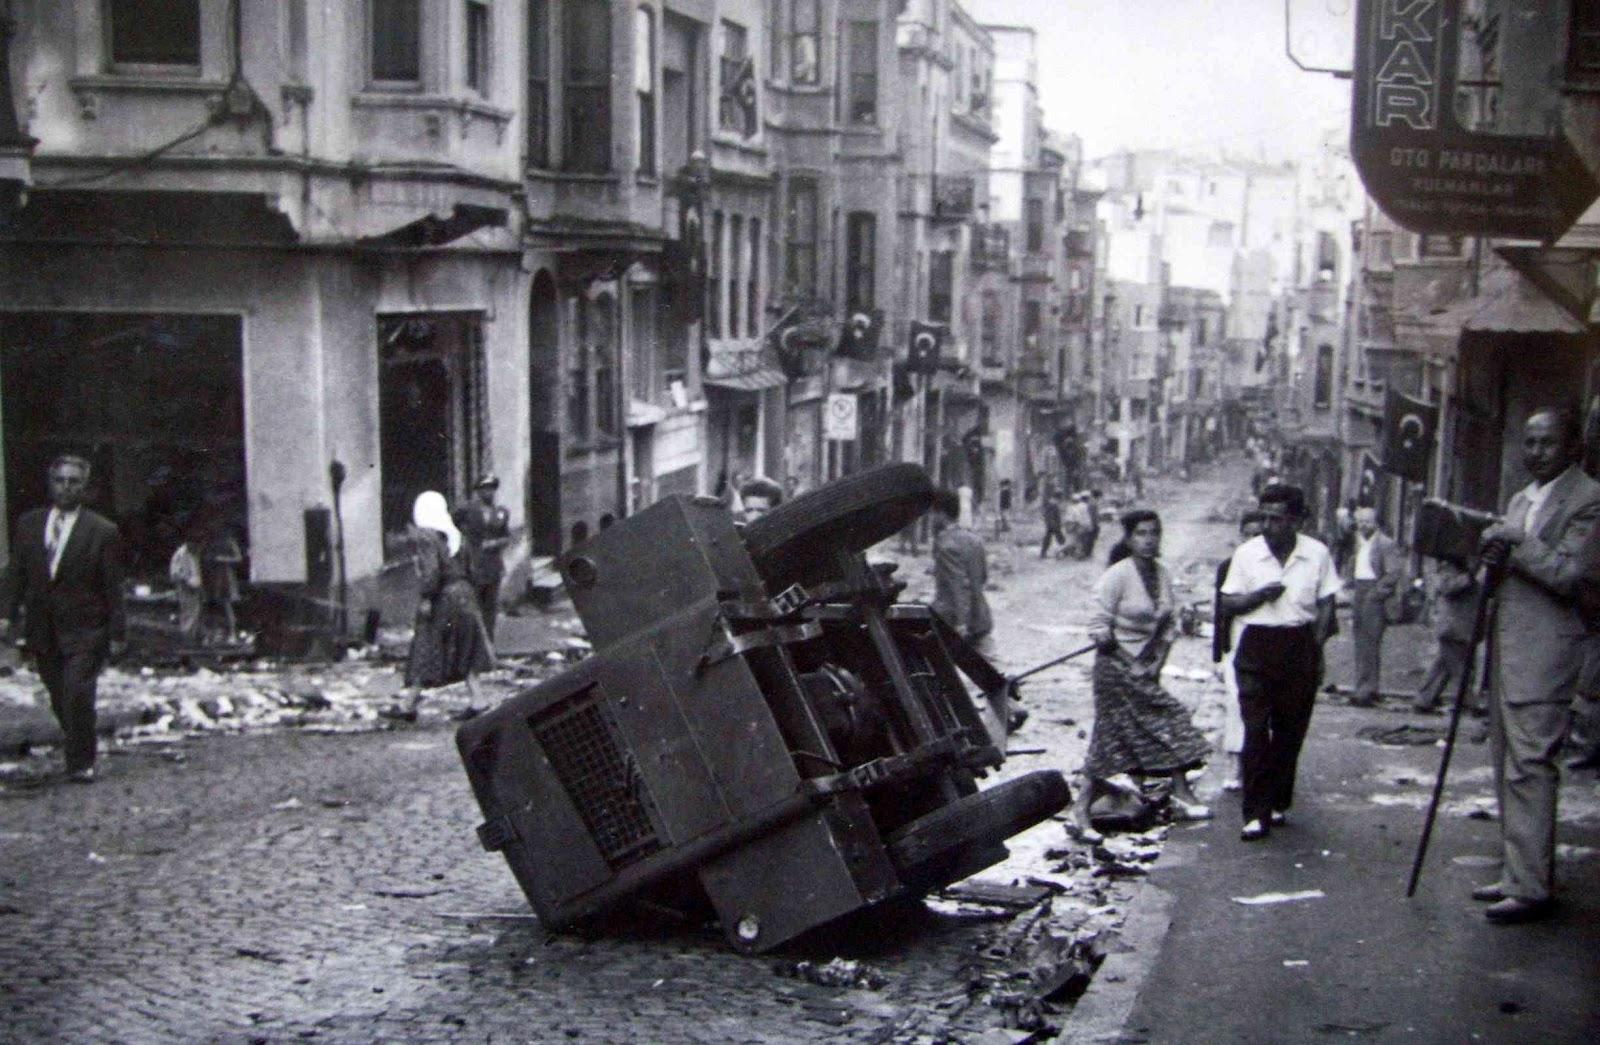 A Greek neighborhood after the pogrom of 6-7 September 1955